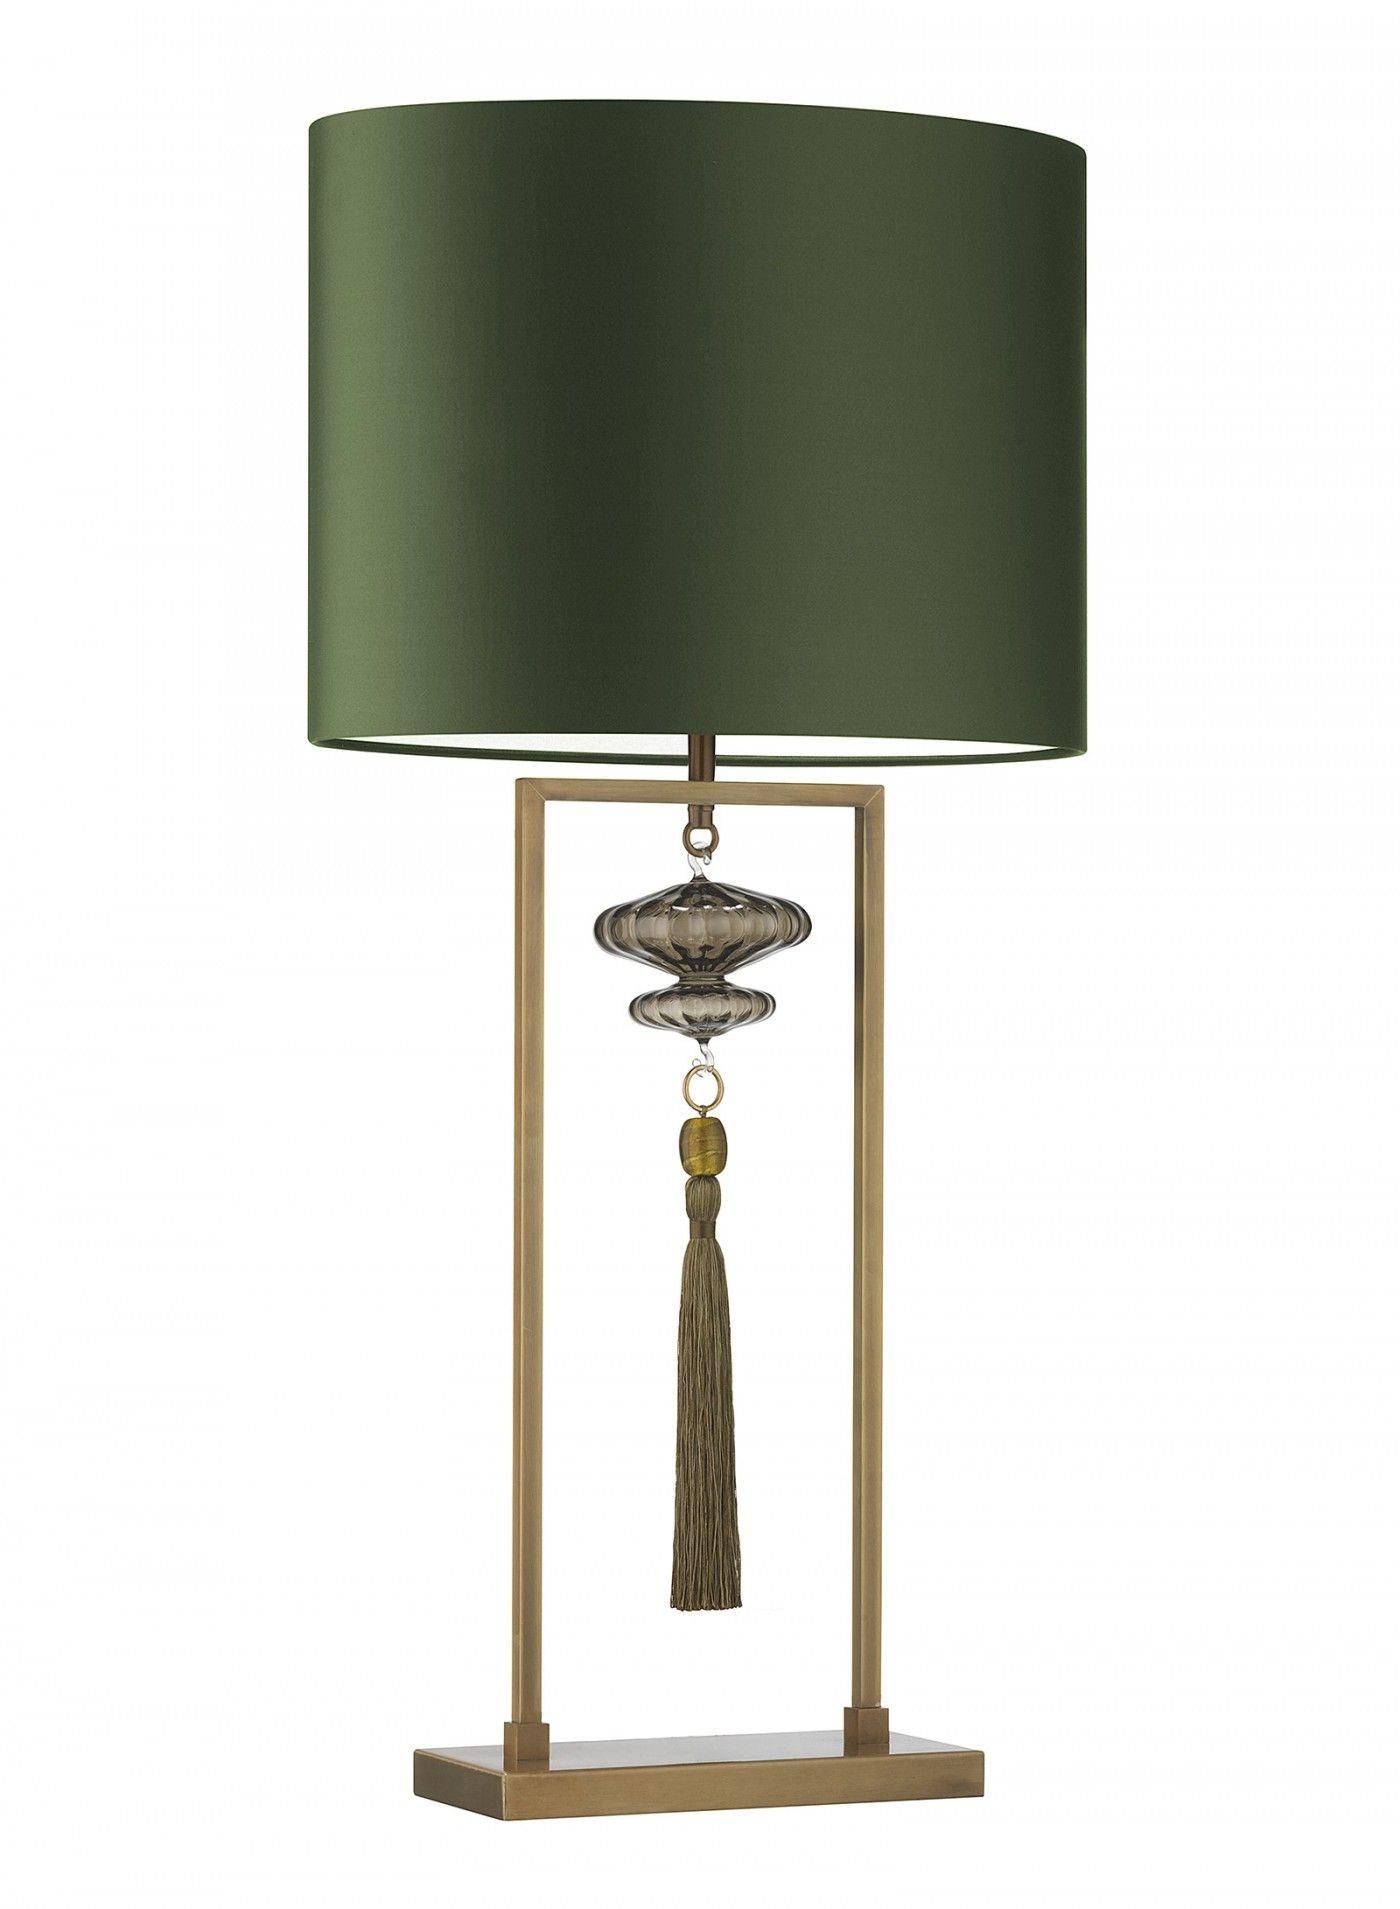 Large Antique Brass Table Lamps | http://argharts.com | Pinterest ...